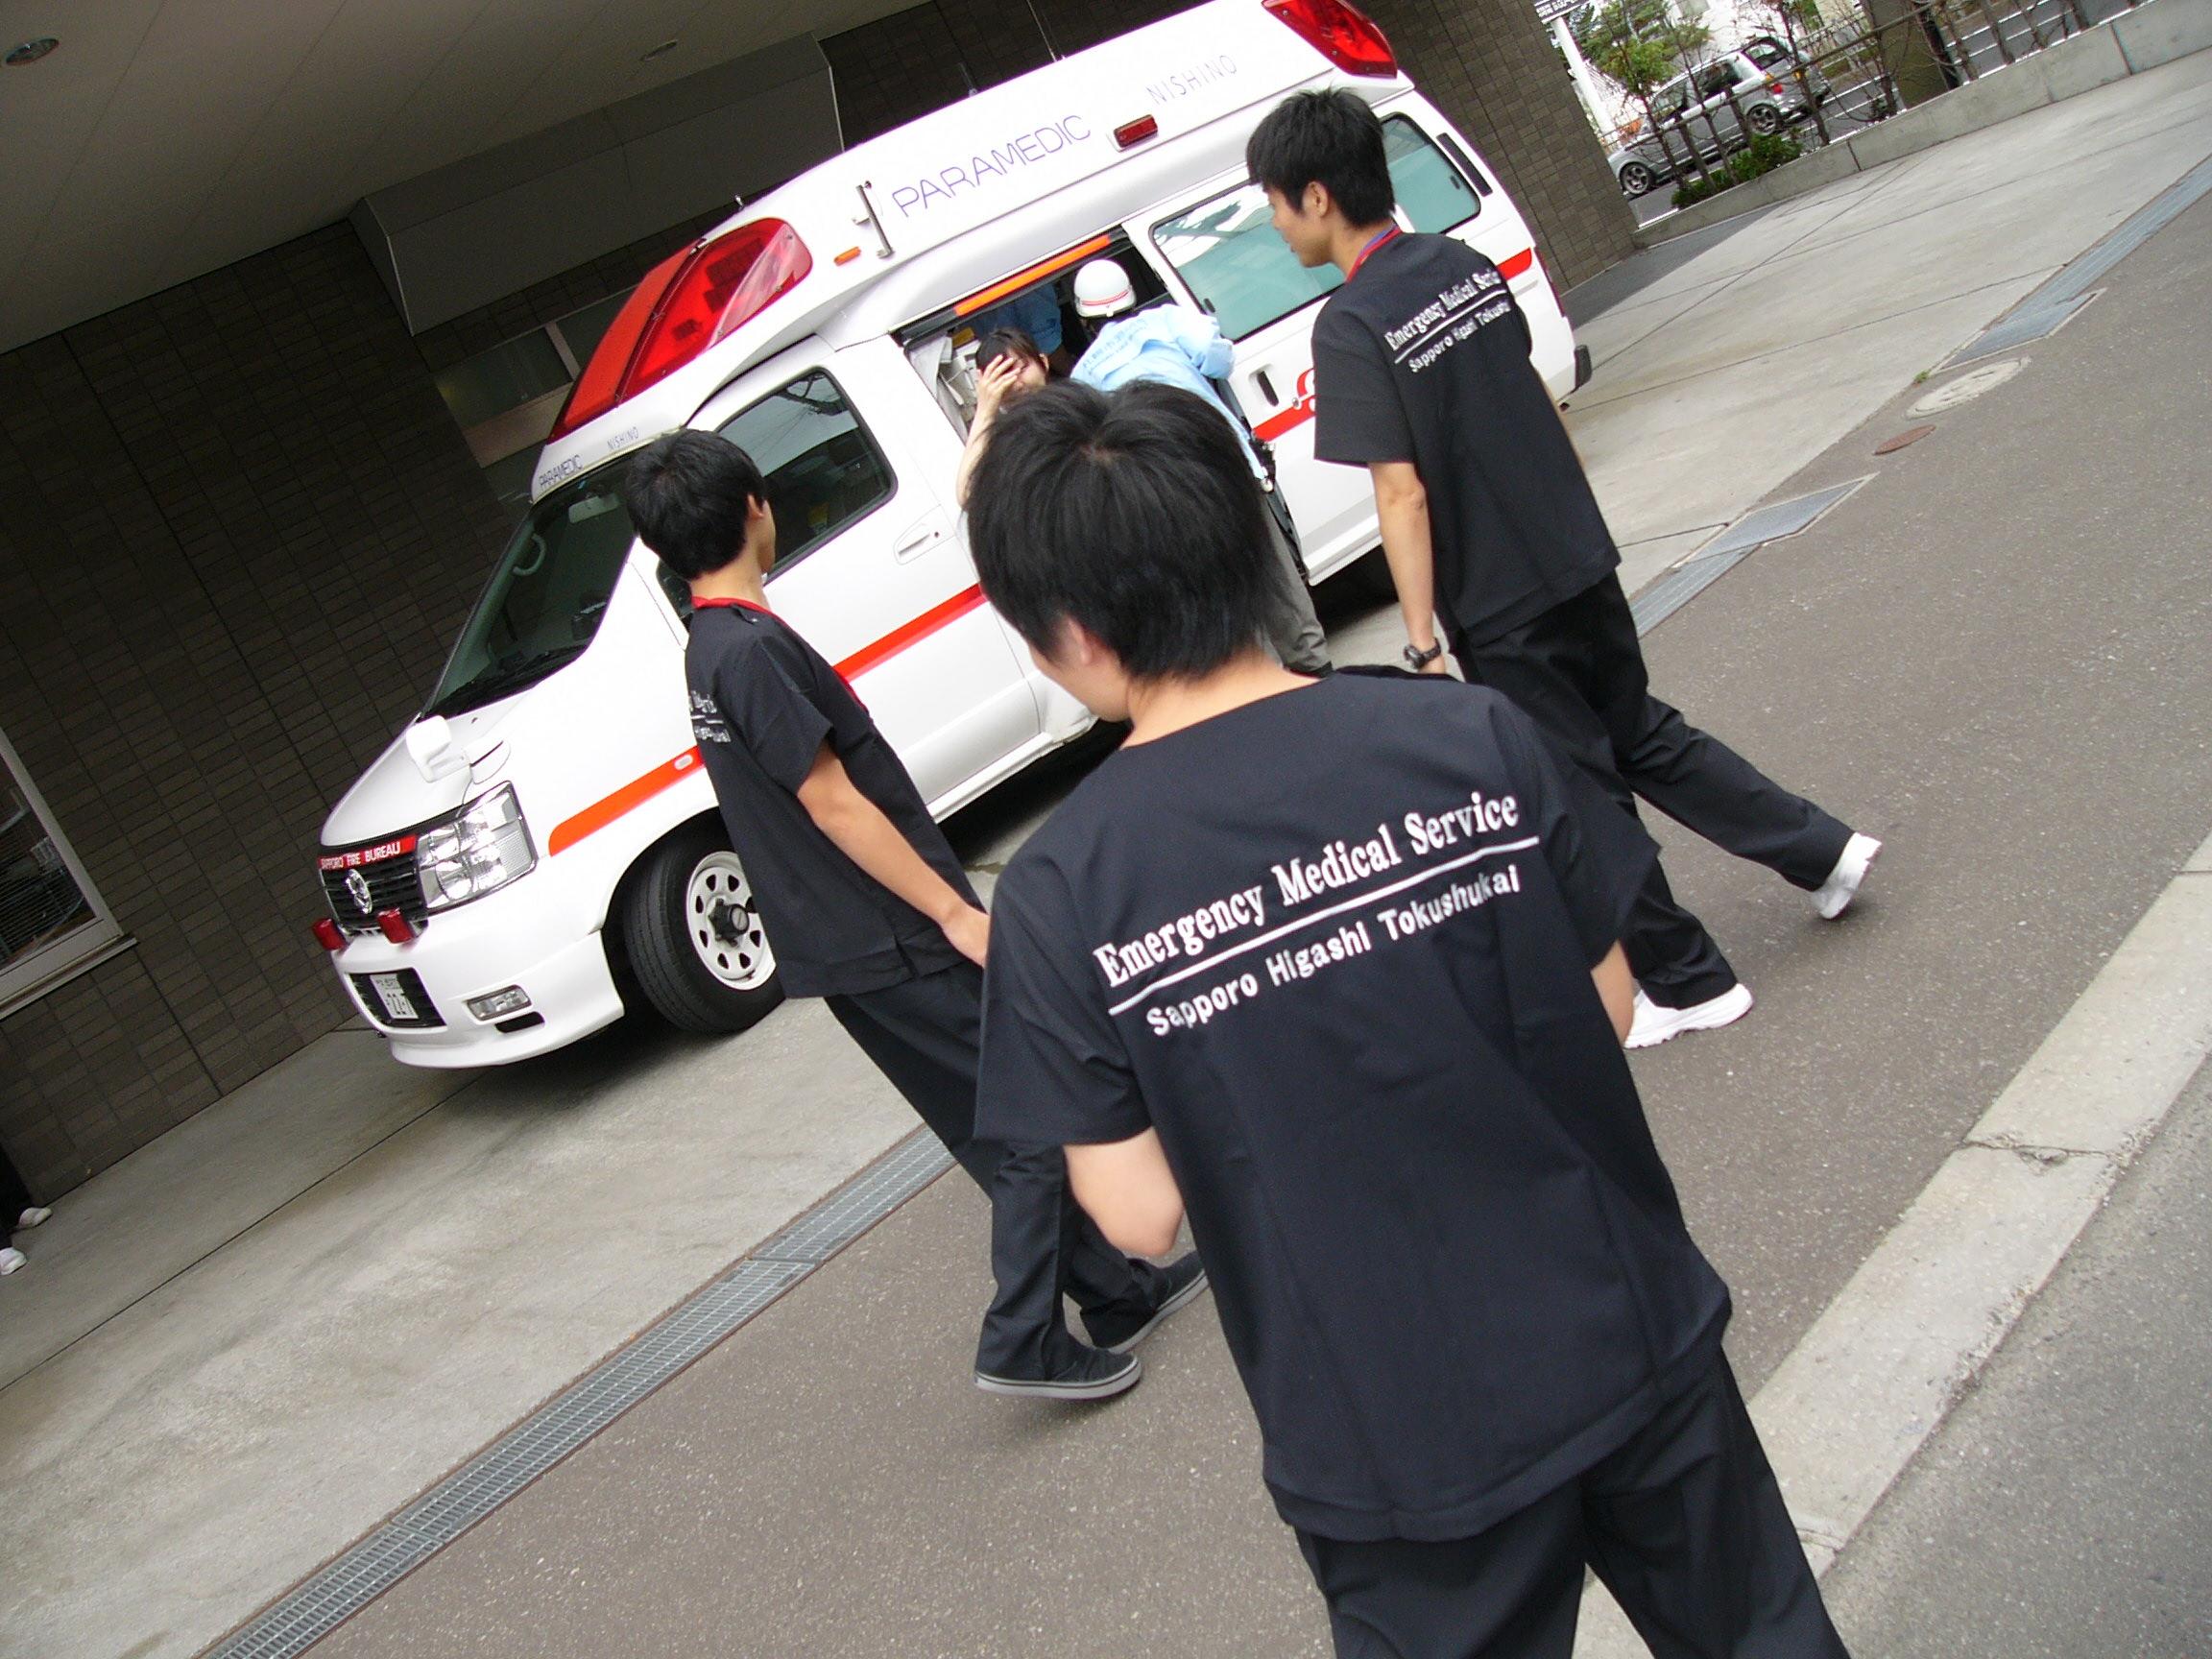 http://blog.higashi-tokushukai.or.jp/ydblog/2013/08/03/%E5%86%99%E7%9C%9F%20%283%29.JPG